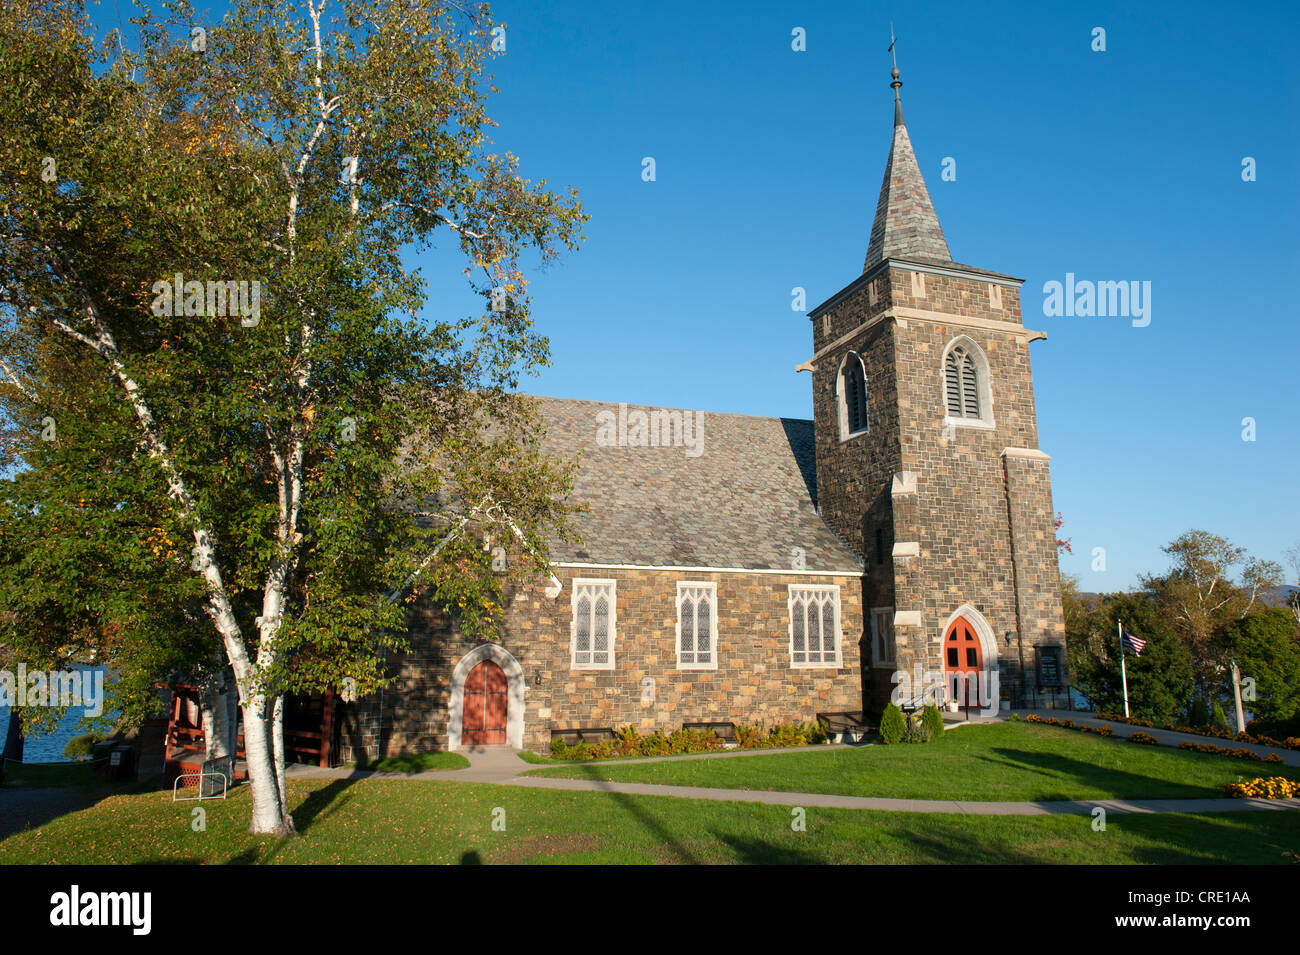 Adirondack Community Church, Methodist church at Mirror Lake, Lake Placid, New York, USA, North America - Stock Image